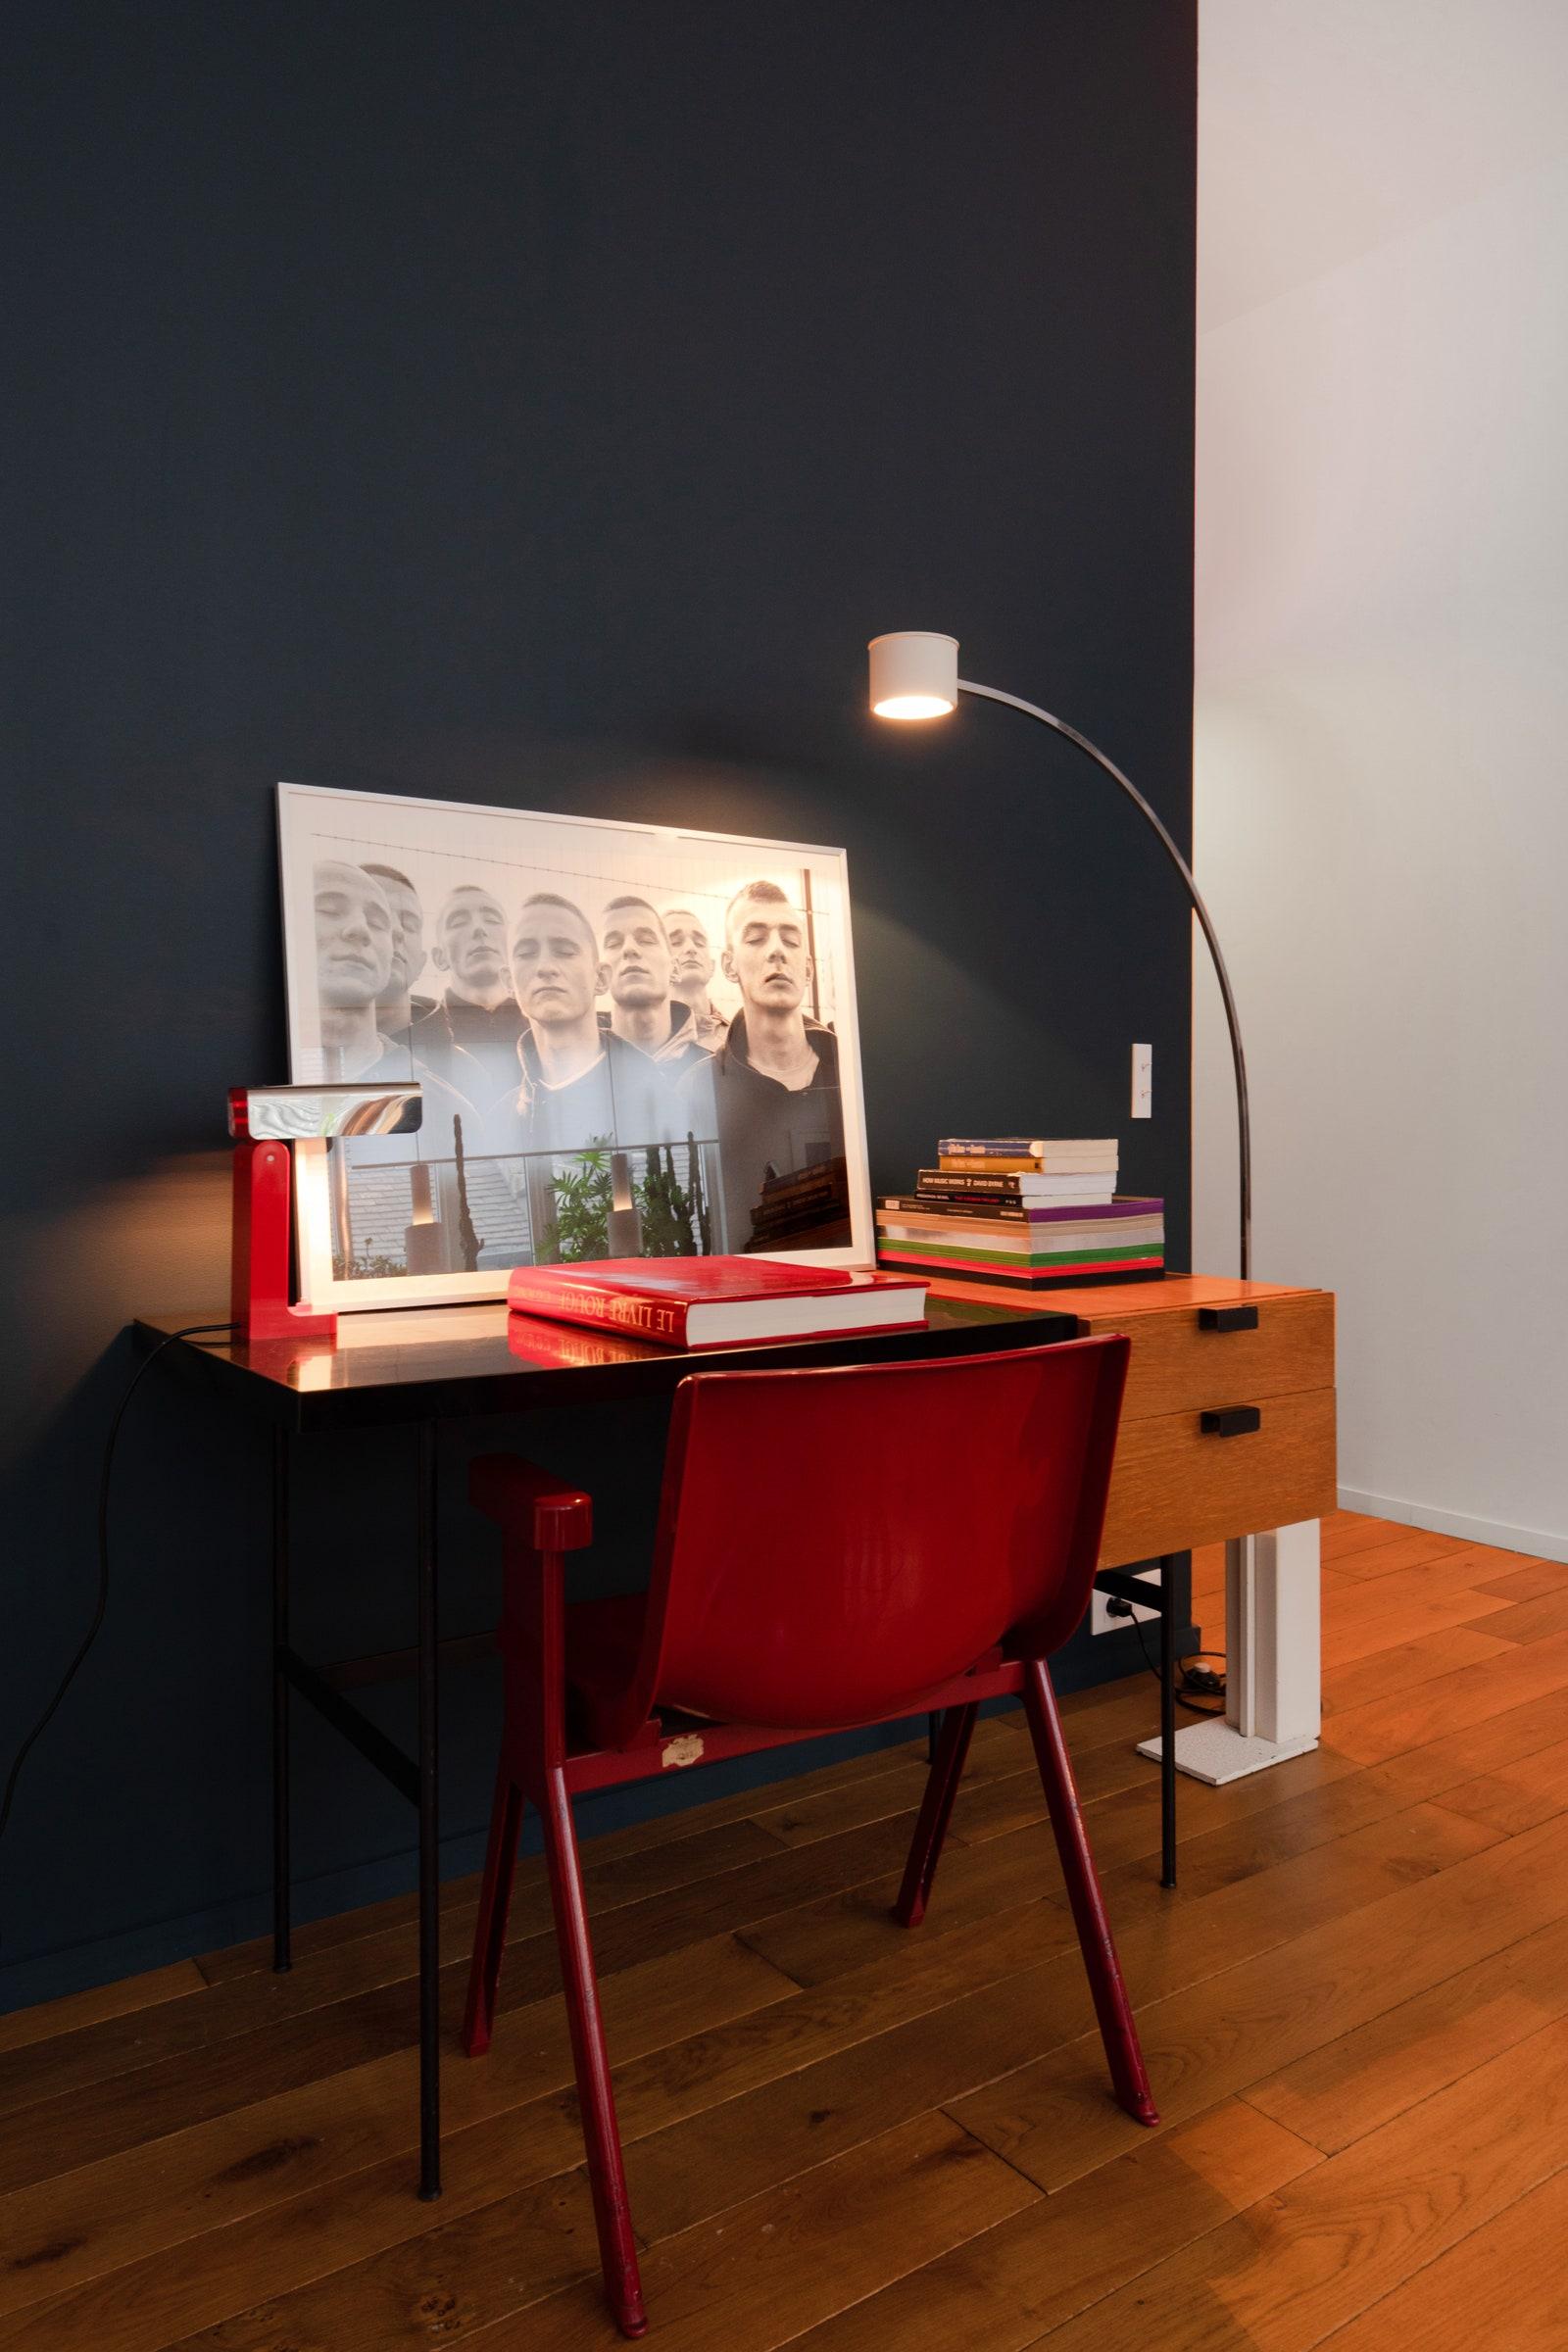 AZuza Krajewska photograph oftroubled teens rests atop Yoann's Pierre Paulin desk.